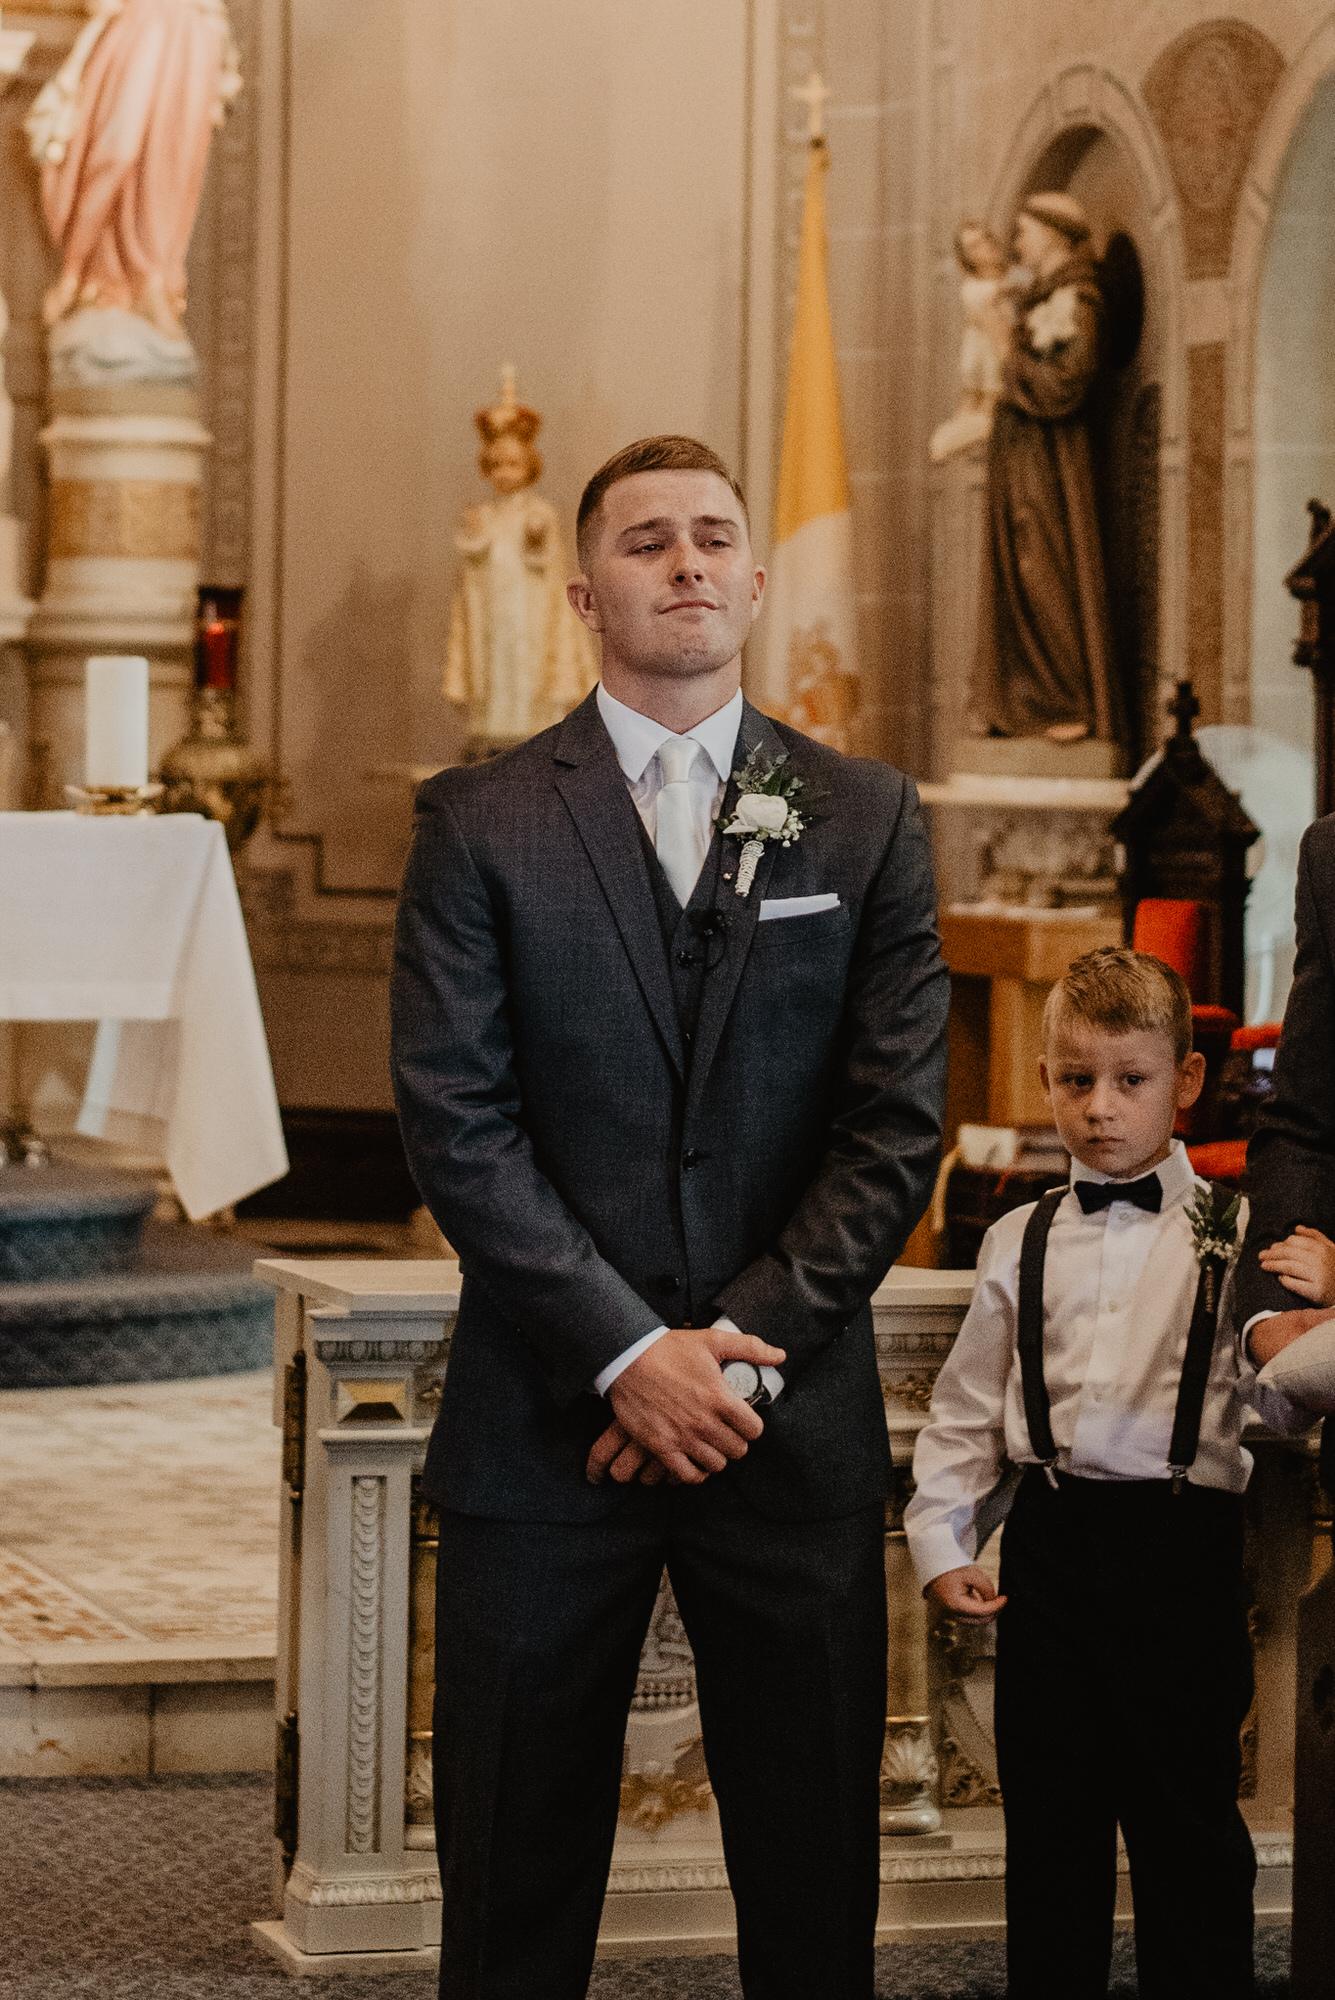 Kaylie Sirek Photography – Nebraska Wedding and Engagement Photographer – 043.jpg